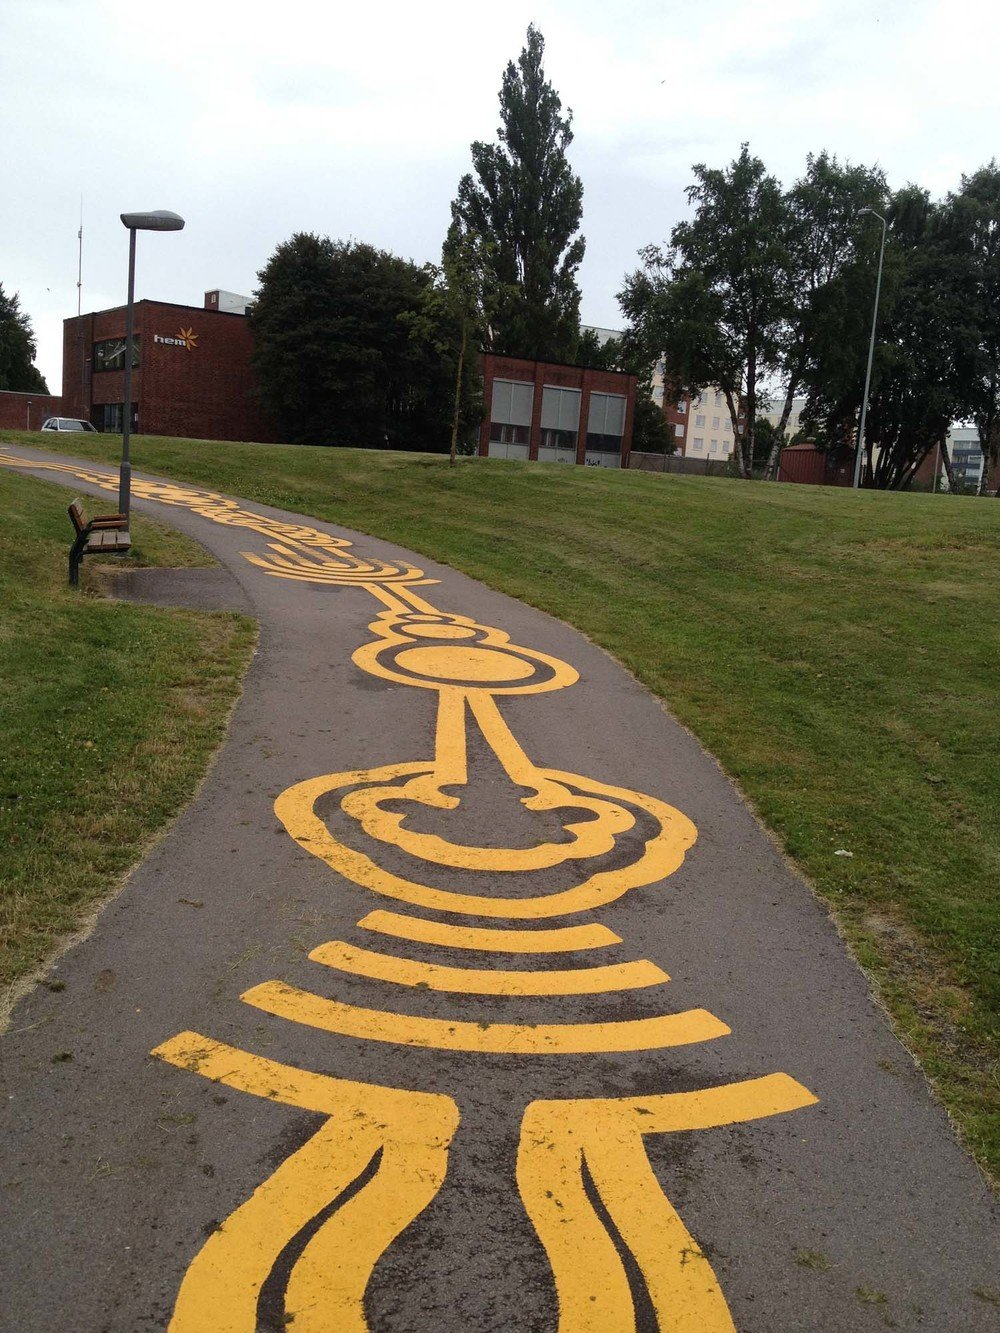 street-art-piste-ciclabili-montreal-roadsworth-13